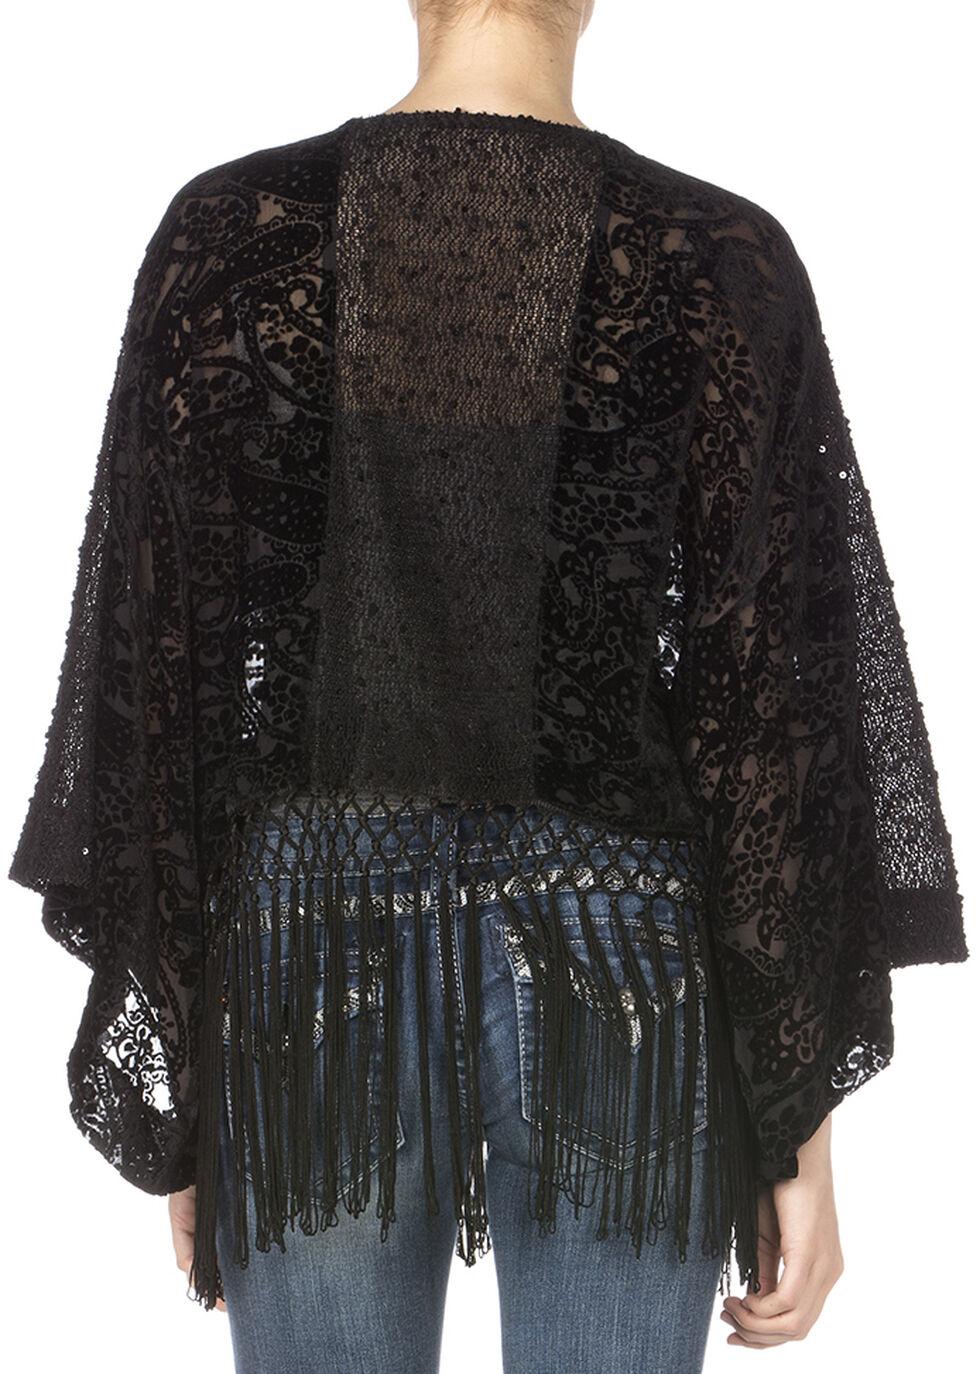 Miss Me Enchanted Lace Top, Black, hi-res